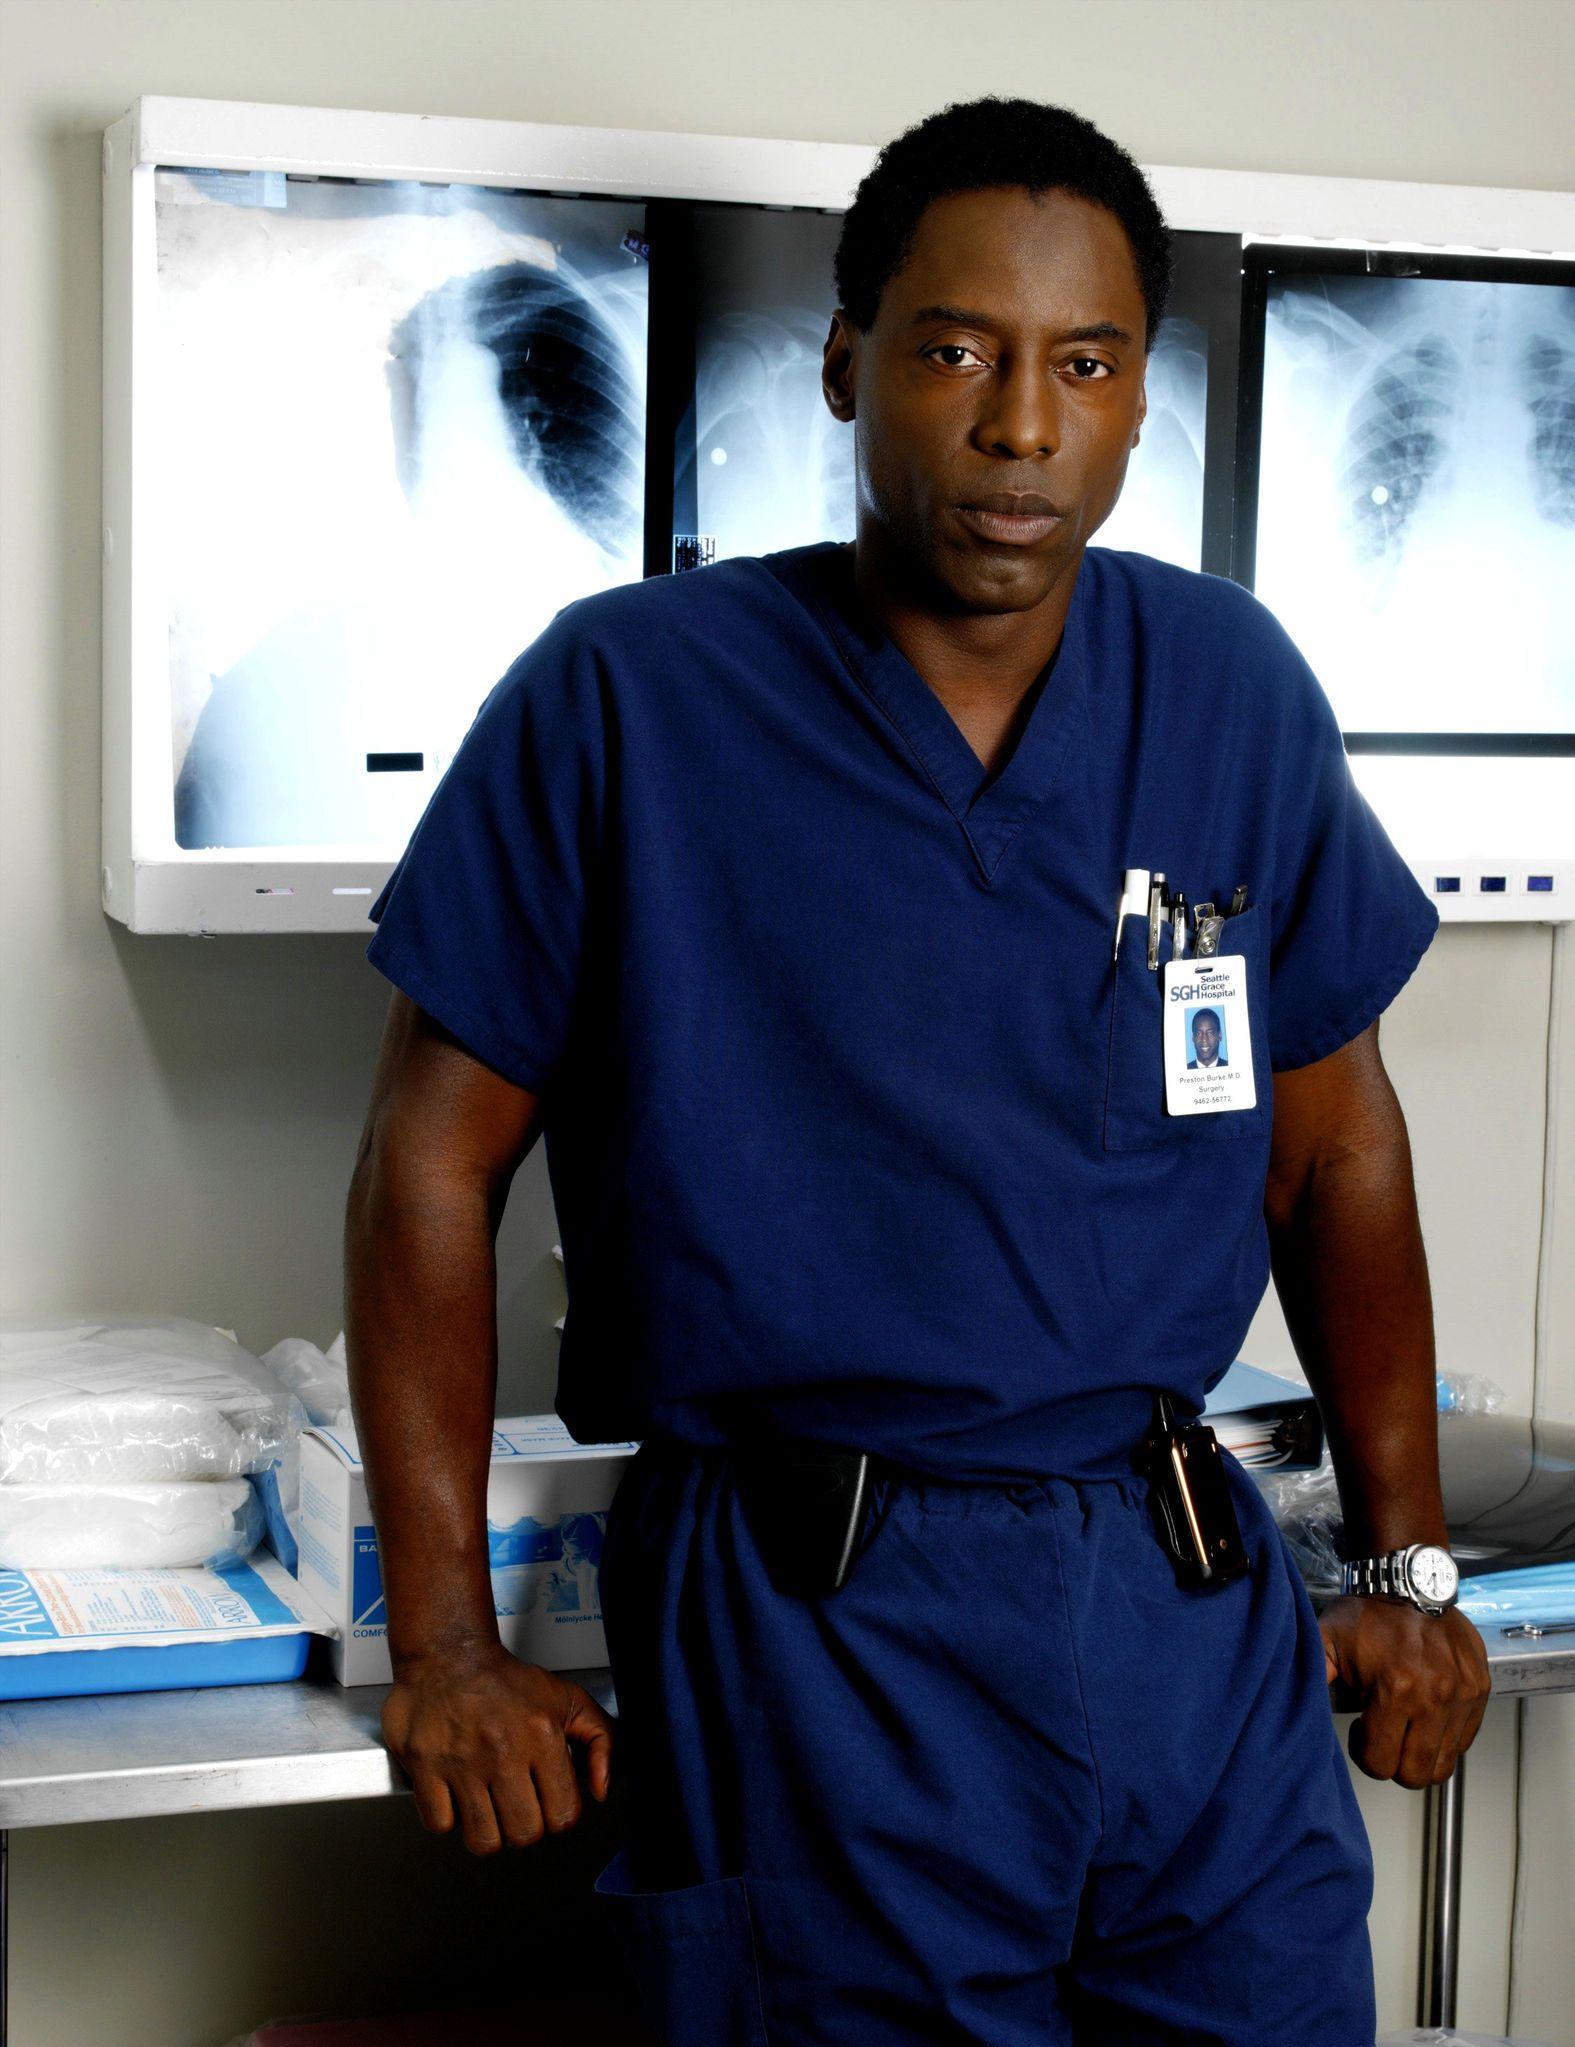 Grey\'s Anatomy - Season 2 Promo   Grey\'s Anatomy   Pinterest ...